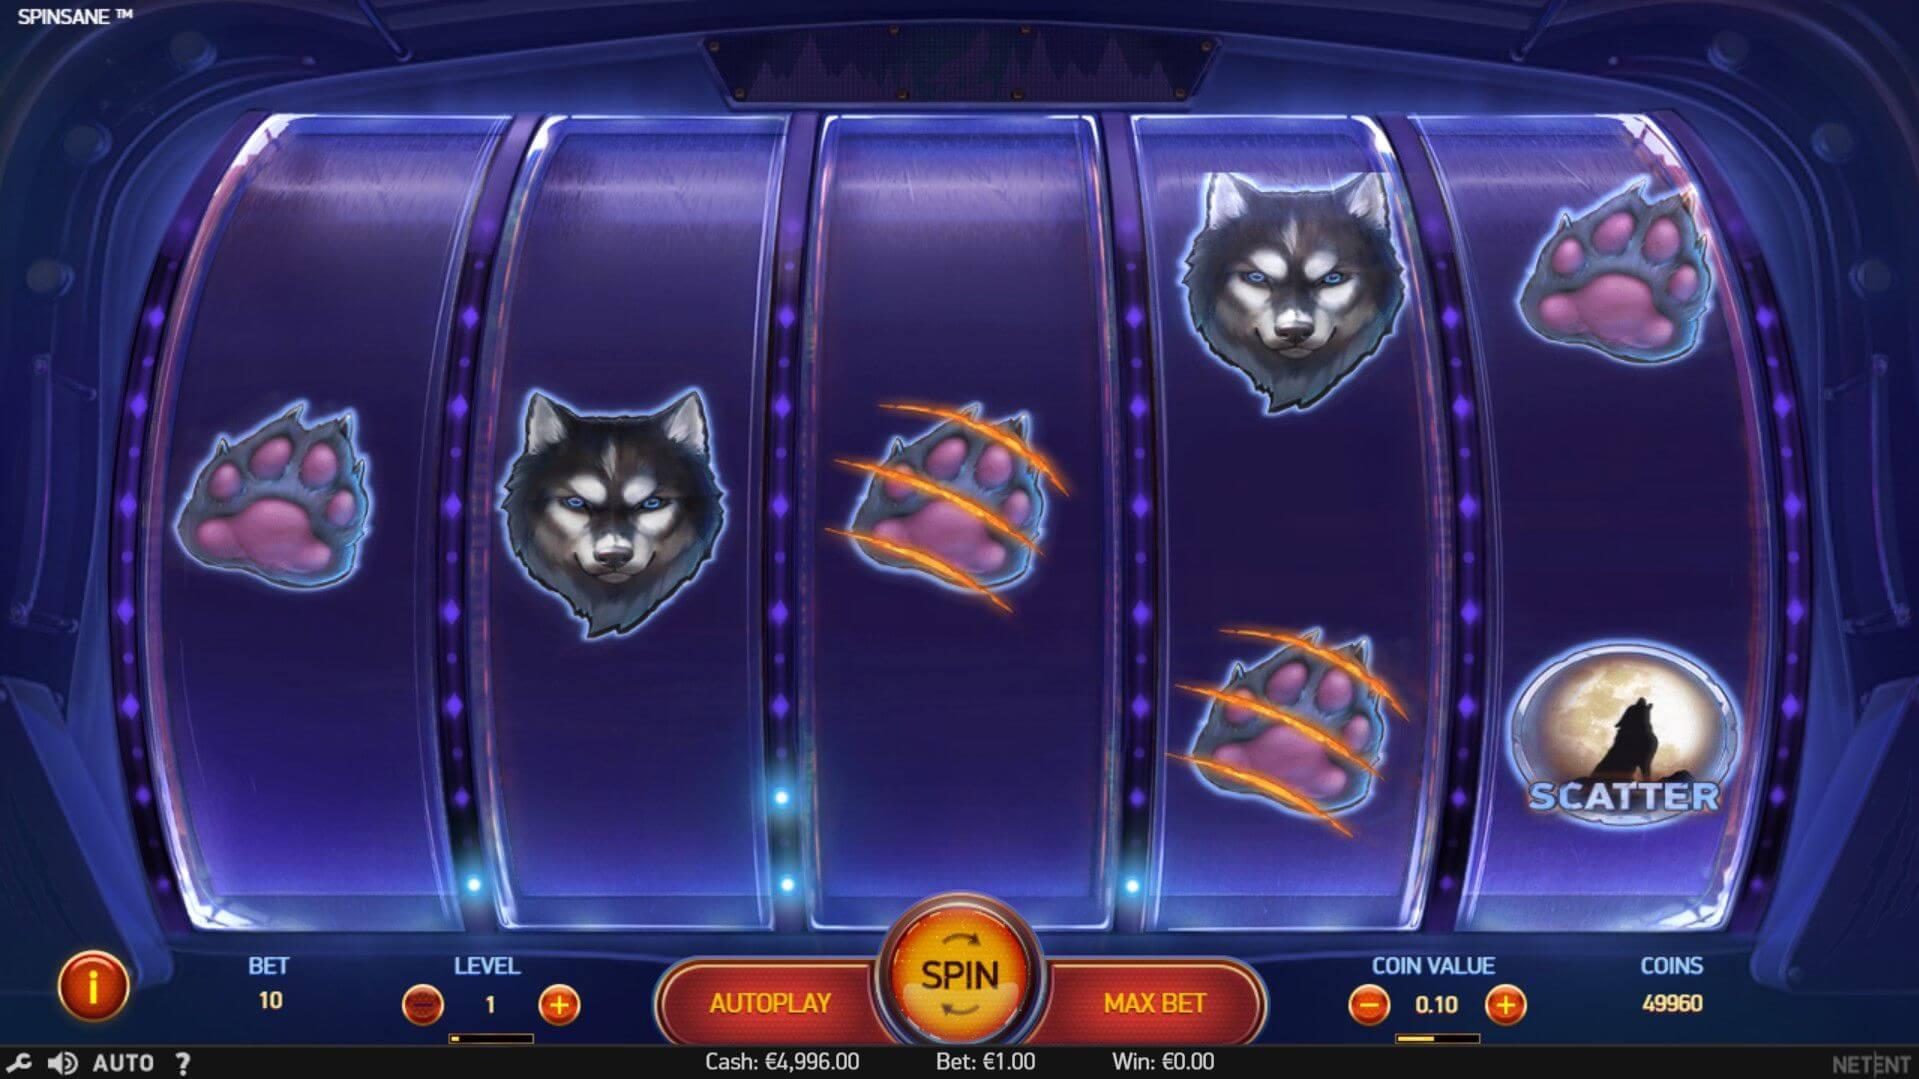 Spinsane Slot Gameplay